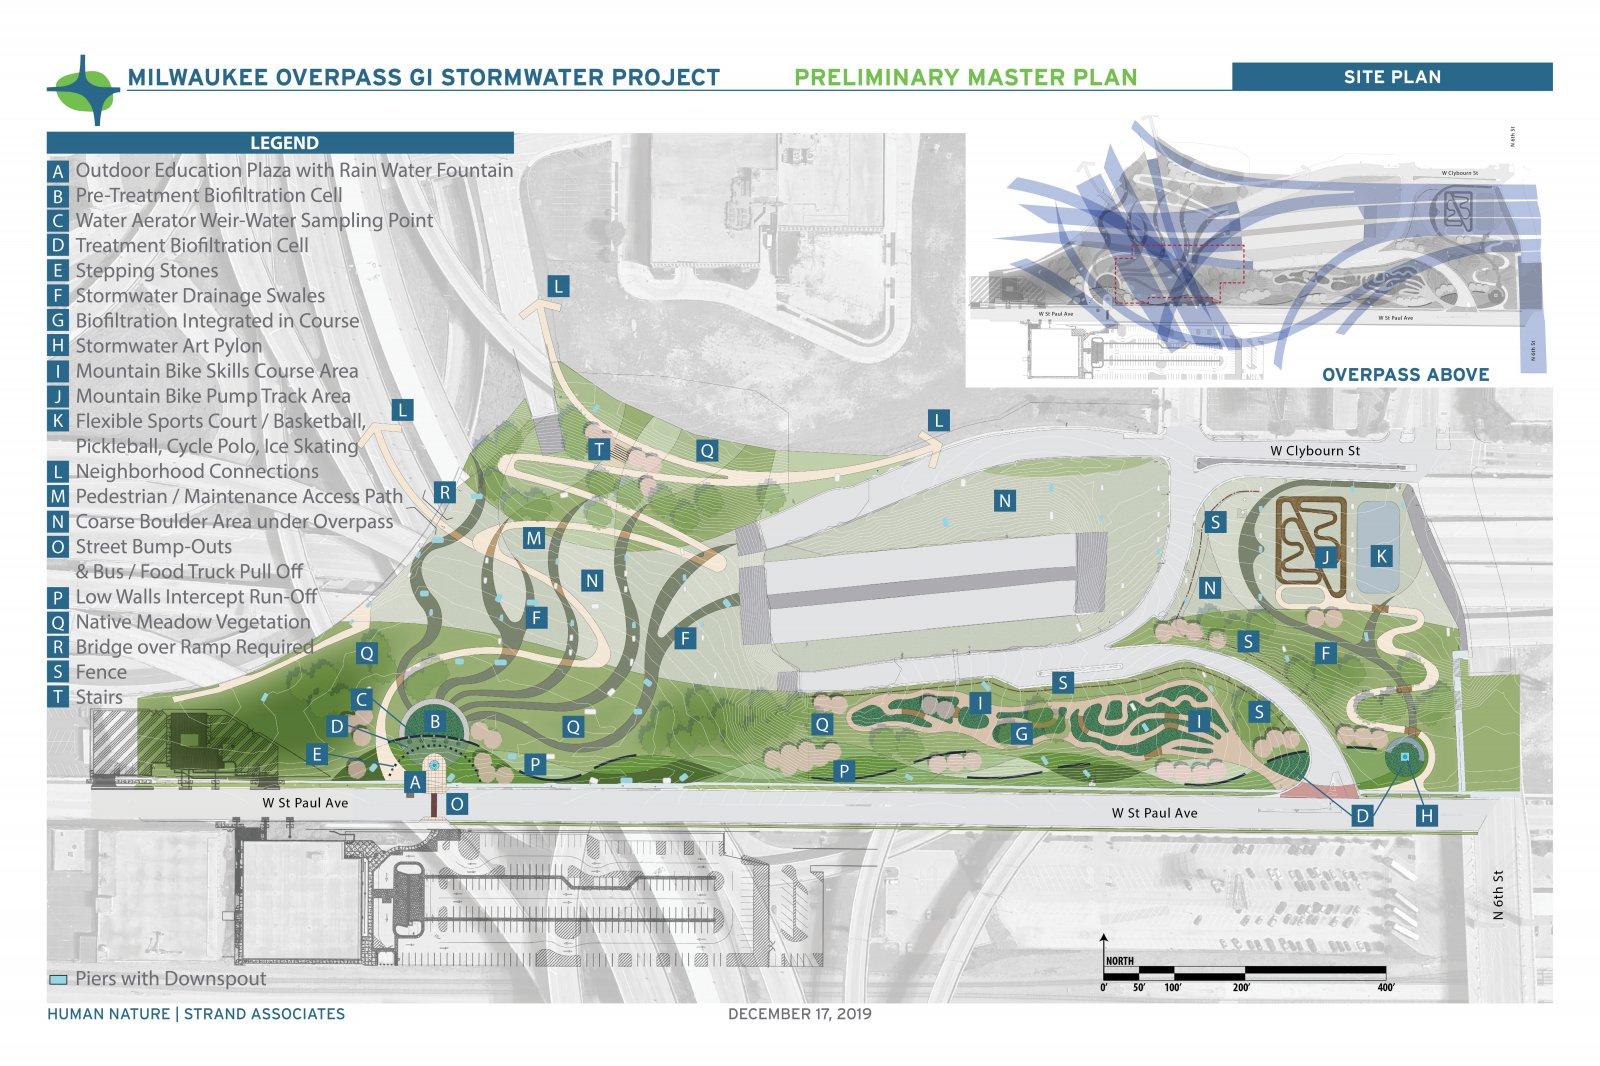 Milwaukee Overpass GI Stormwater Project Master Plan